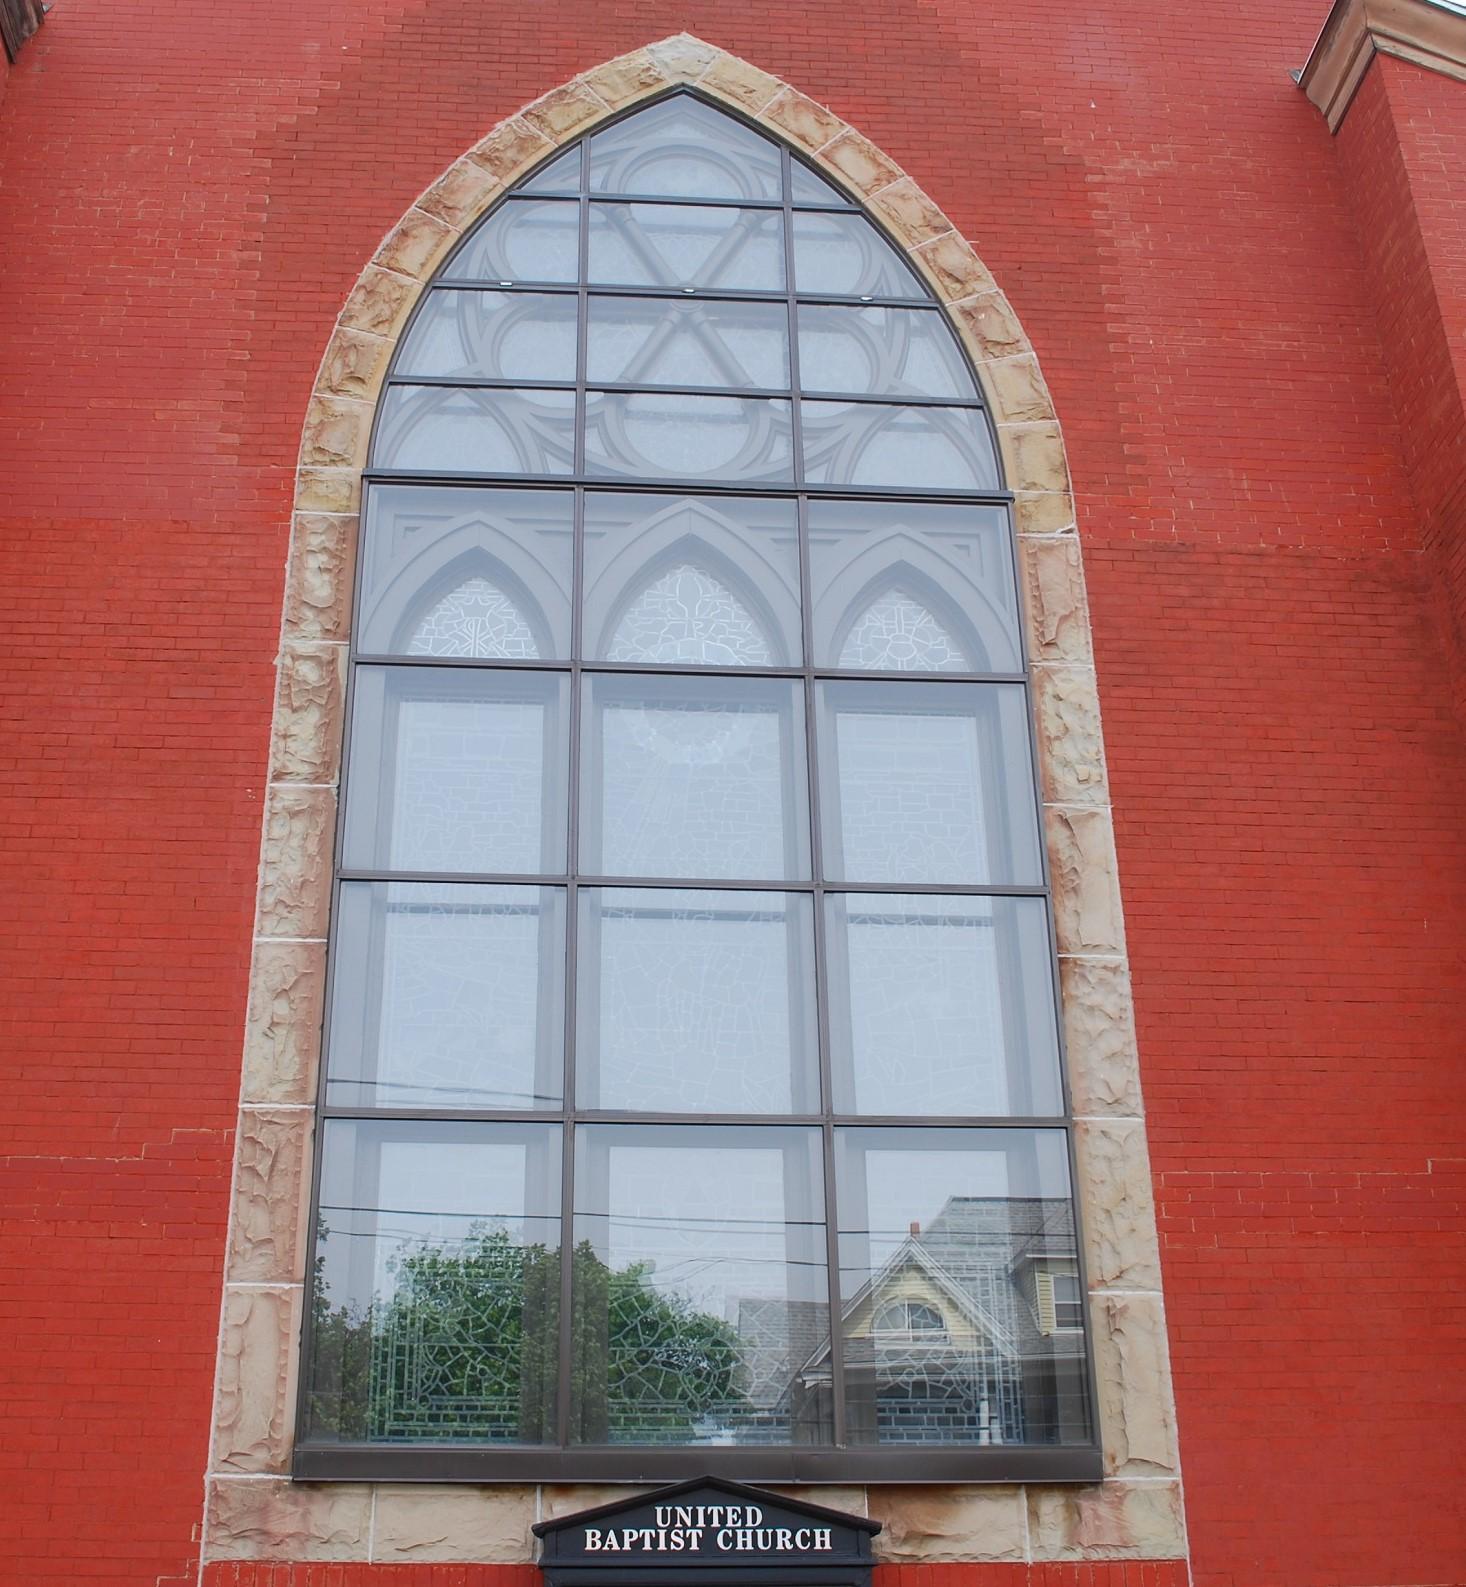 United Baptist Church Scranton, PA